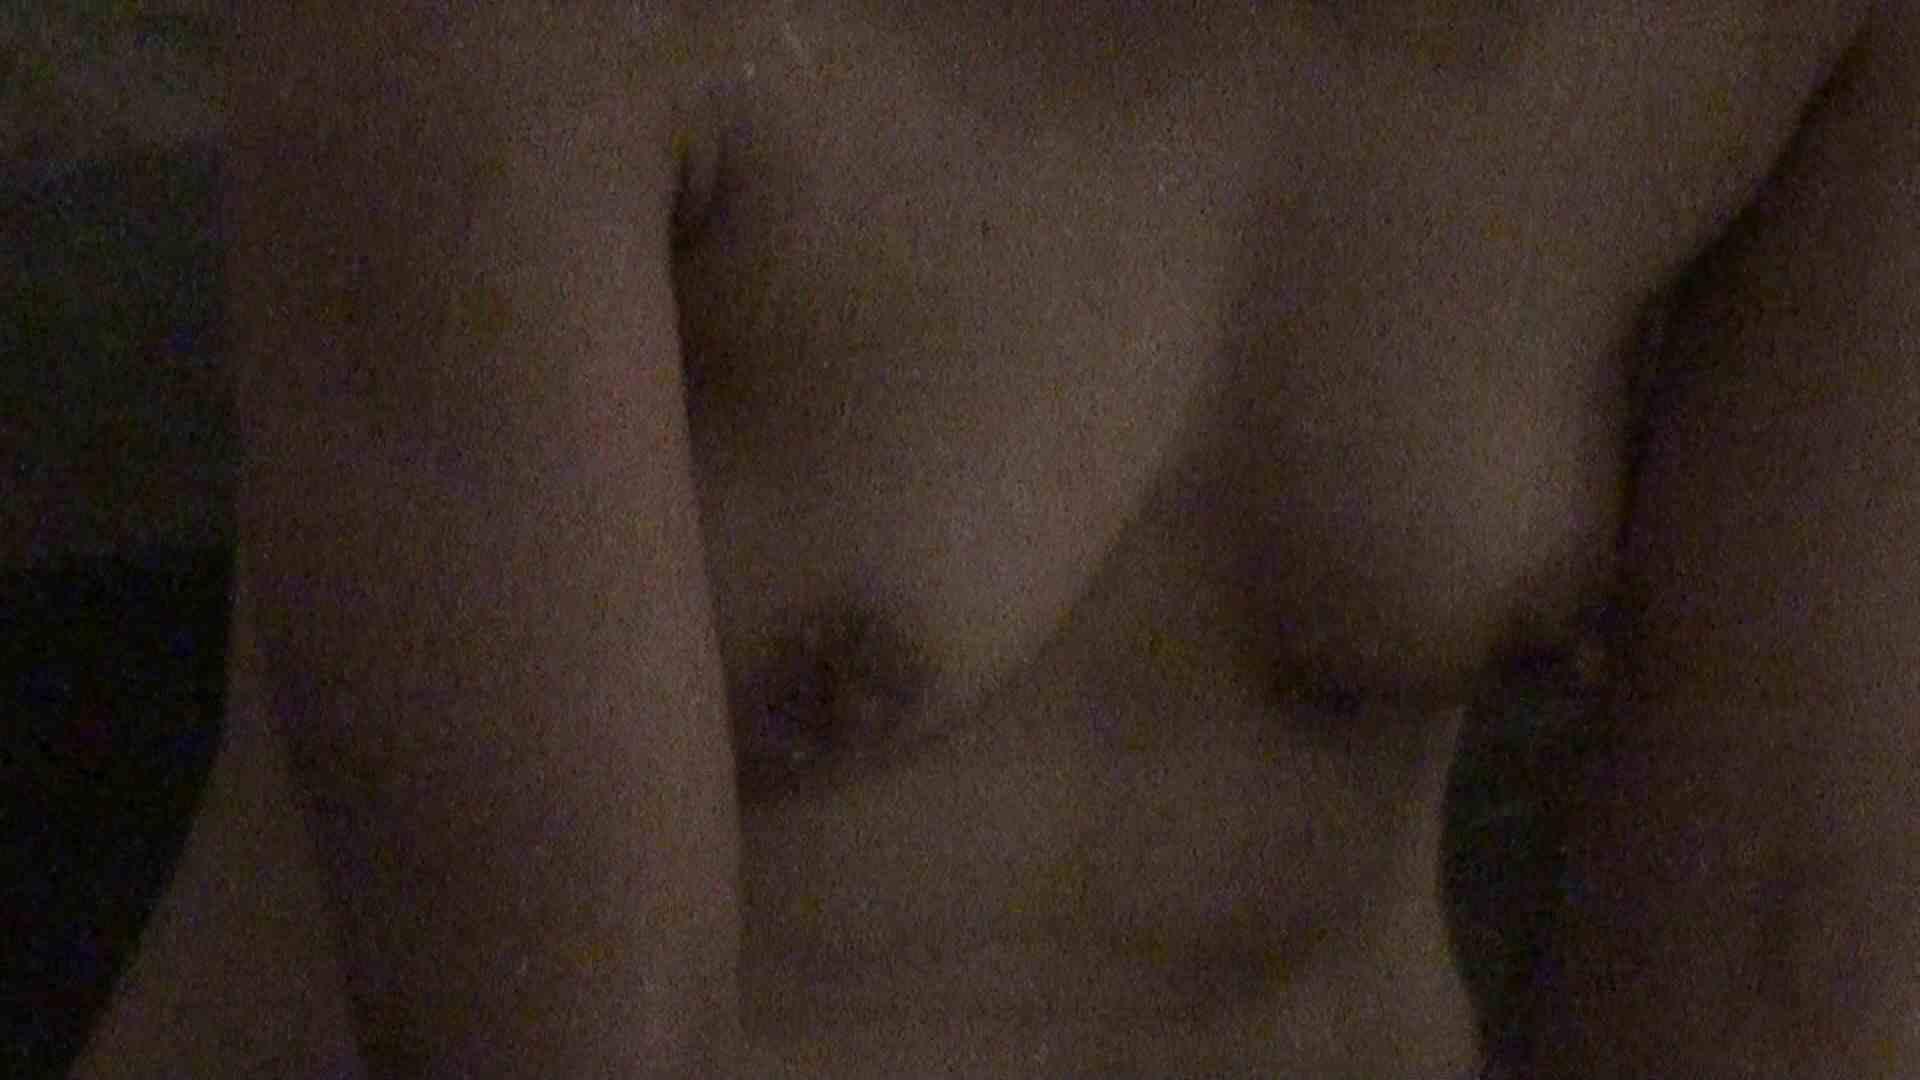 Aquaな露天風呂Vol.426 美しいOLの裸体 AV無料動画キャプチャ 70pic 26